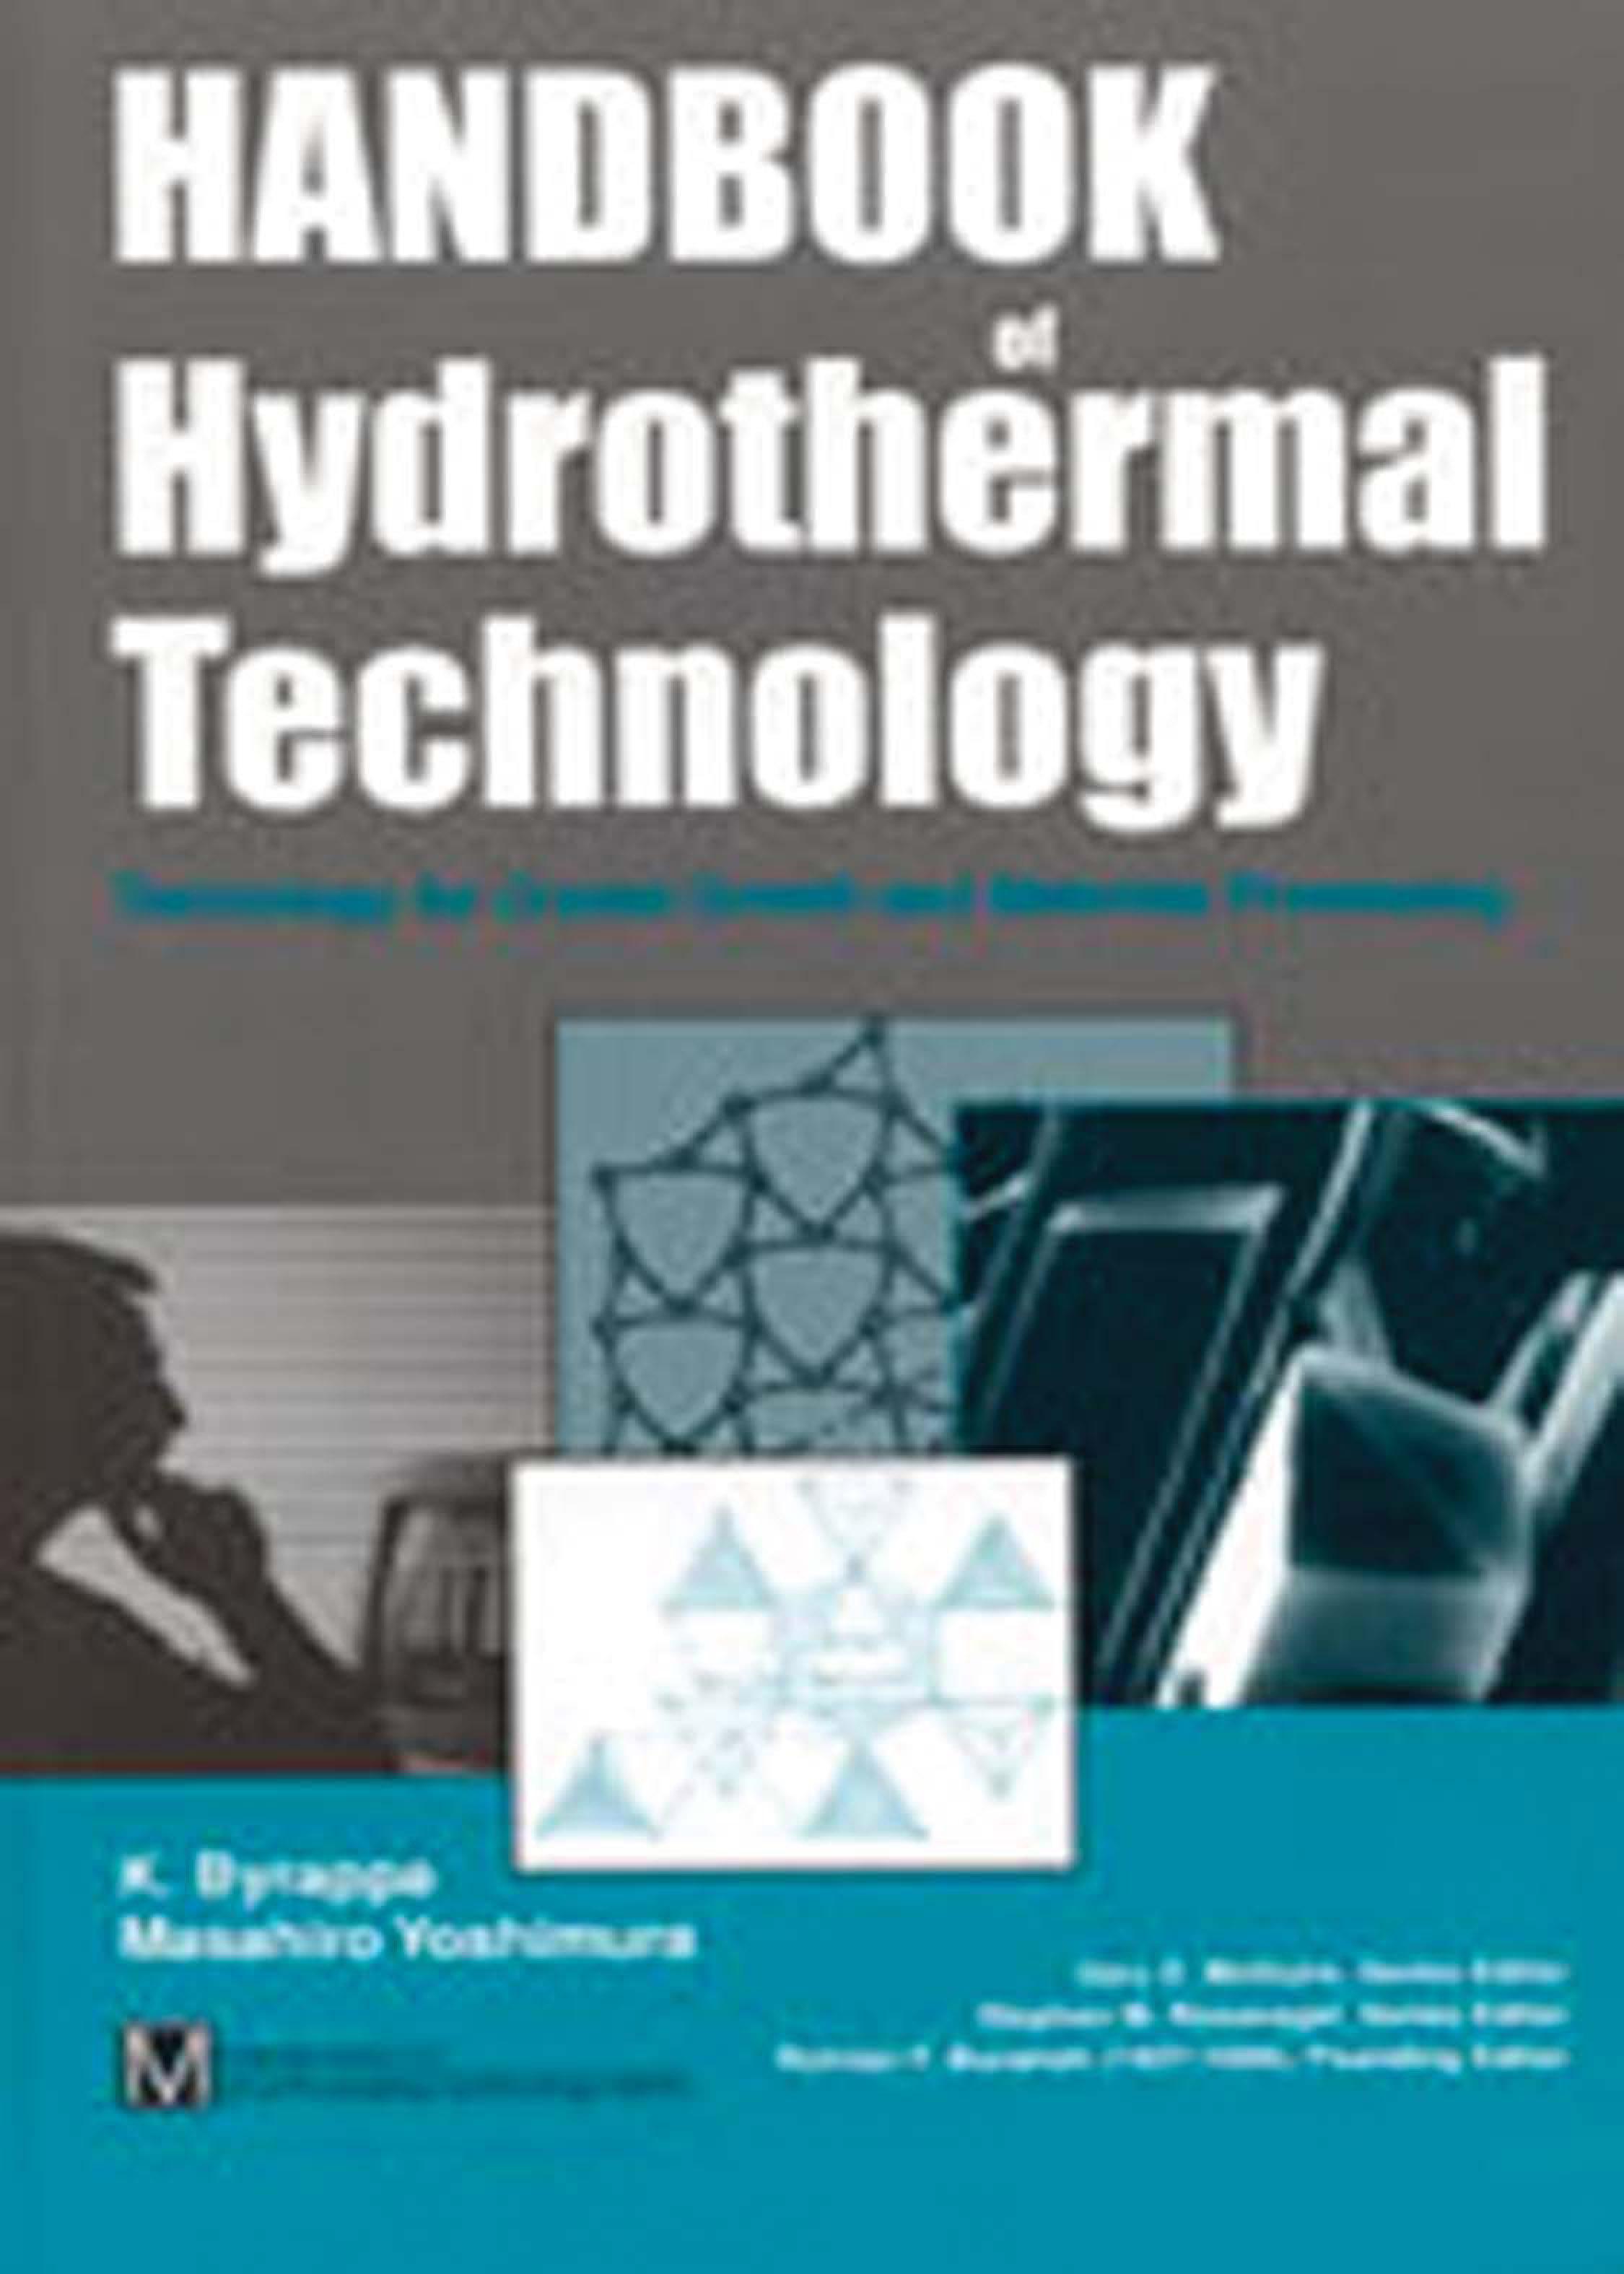 Hydrothermal Handbook K. Byrappa, Masahiro Haber